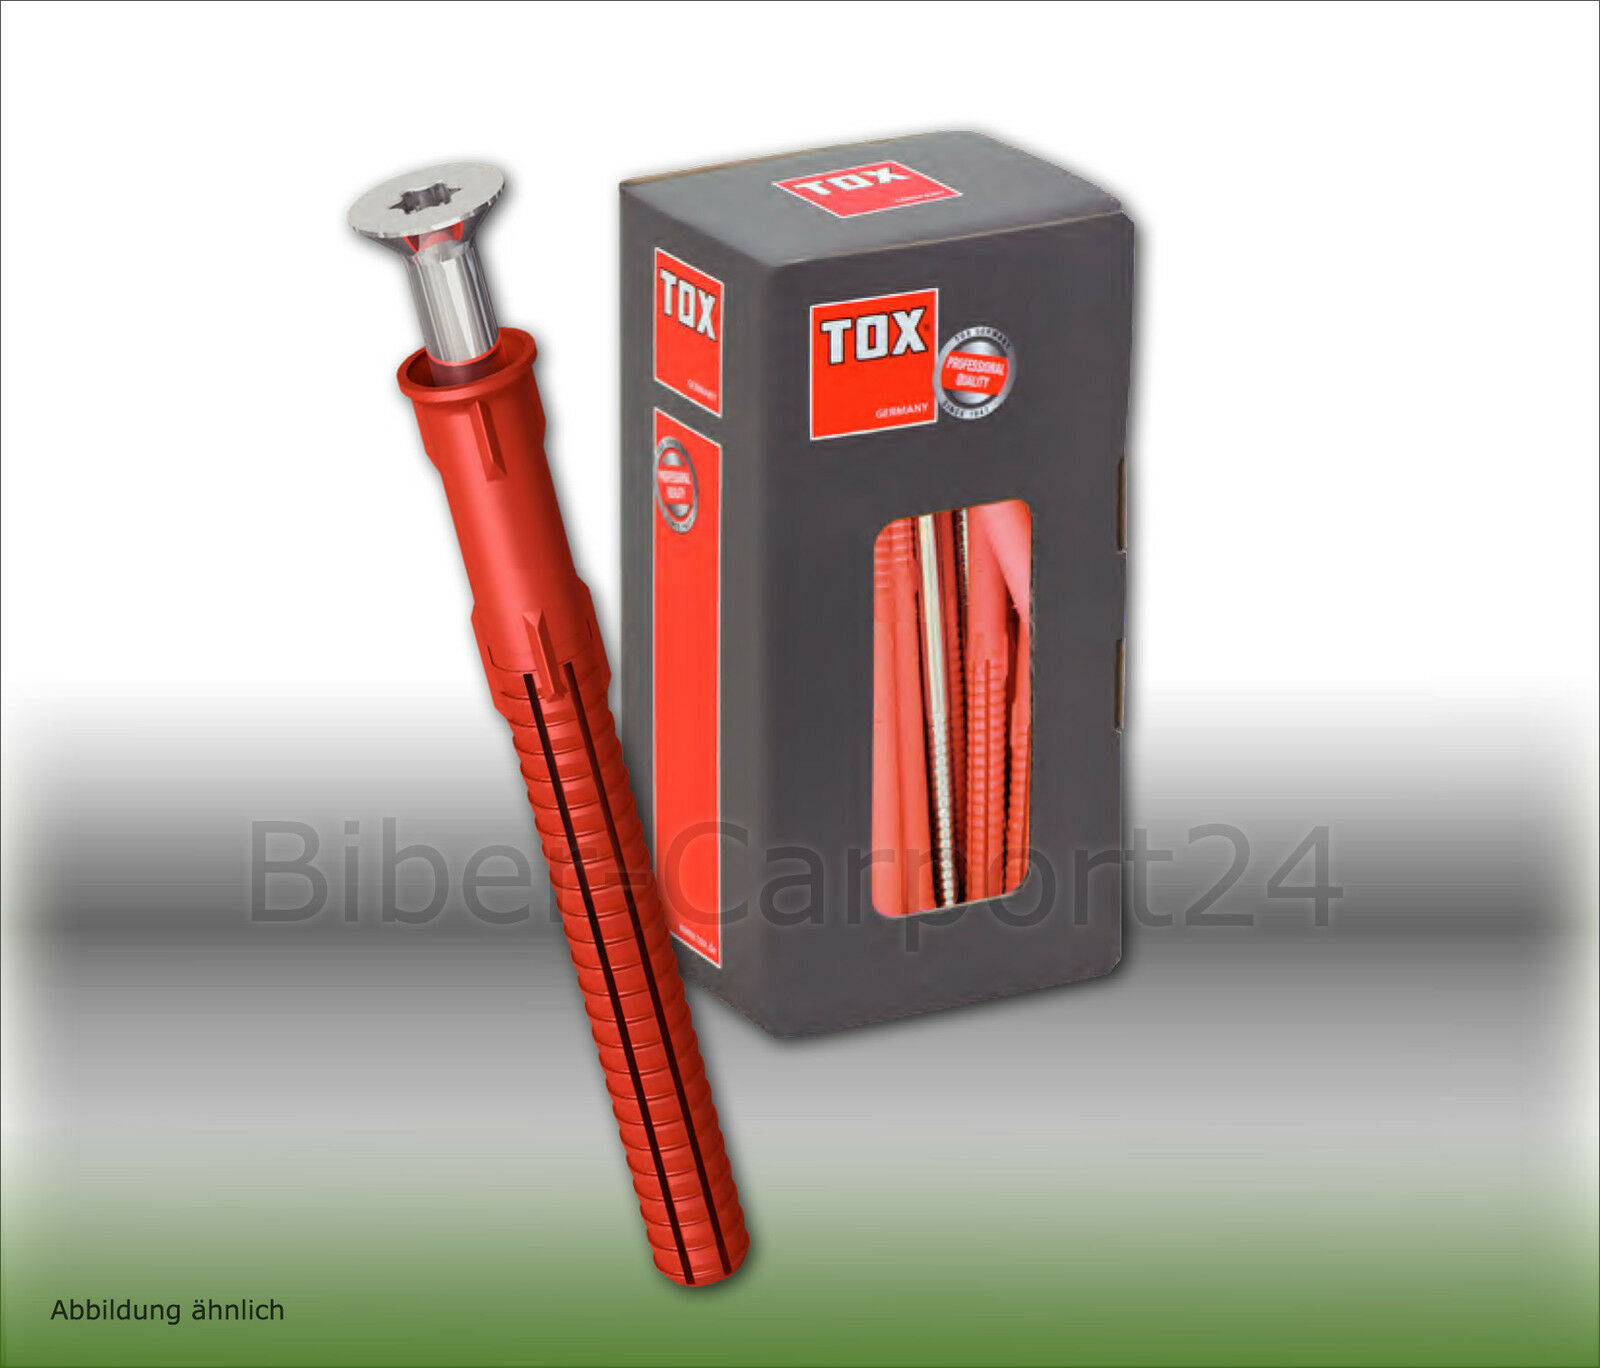 Tox FASSAD PRO SK SDF-S10 H, Rahmendübel, Senkkopfschraube, Fassade, Kunststoff